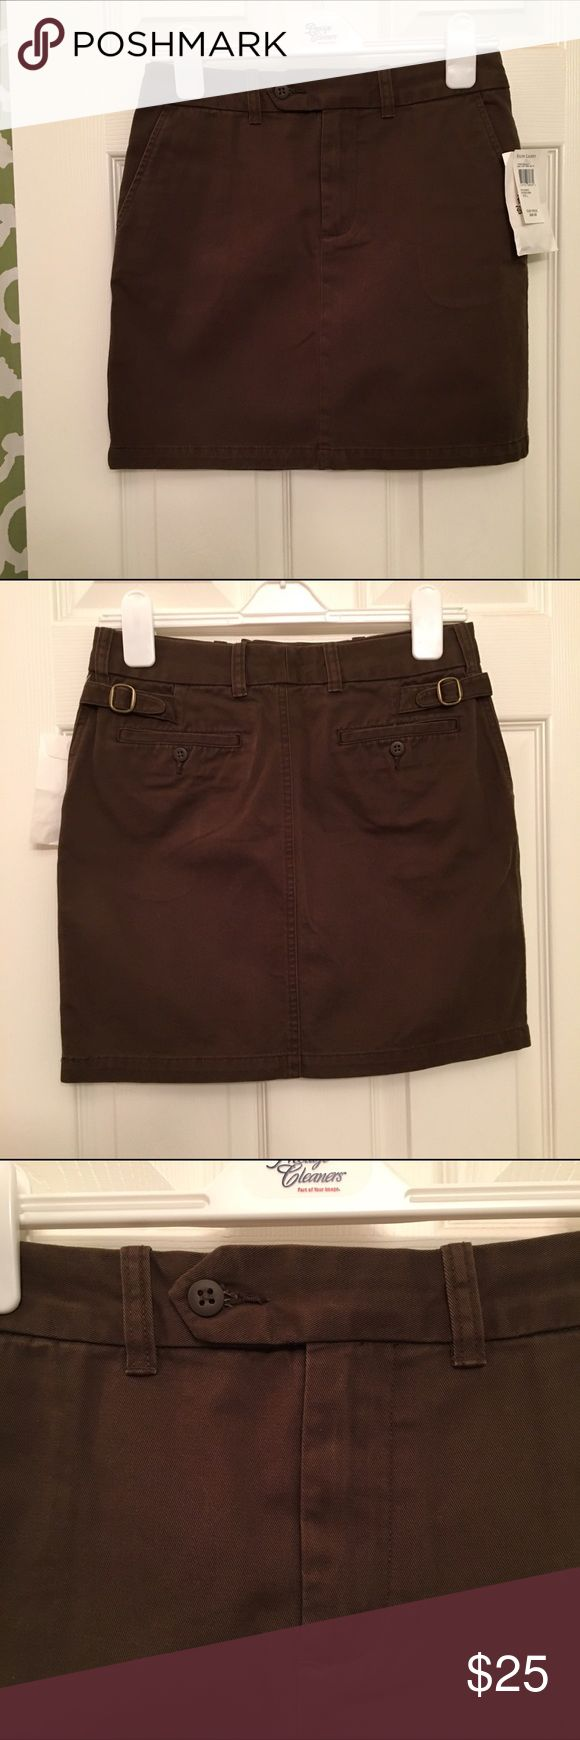 NWT Brown Ralph Lauren Pencil Skirt NWT brown pencil skirt. Gold clasp detail on the back. Ralph Lauren Skirts Pencil